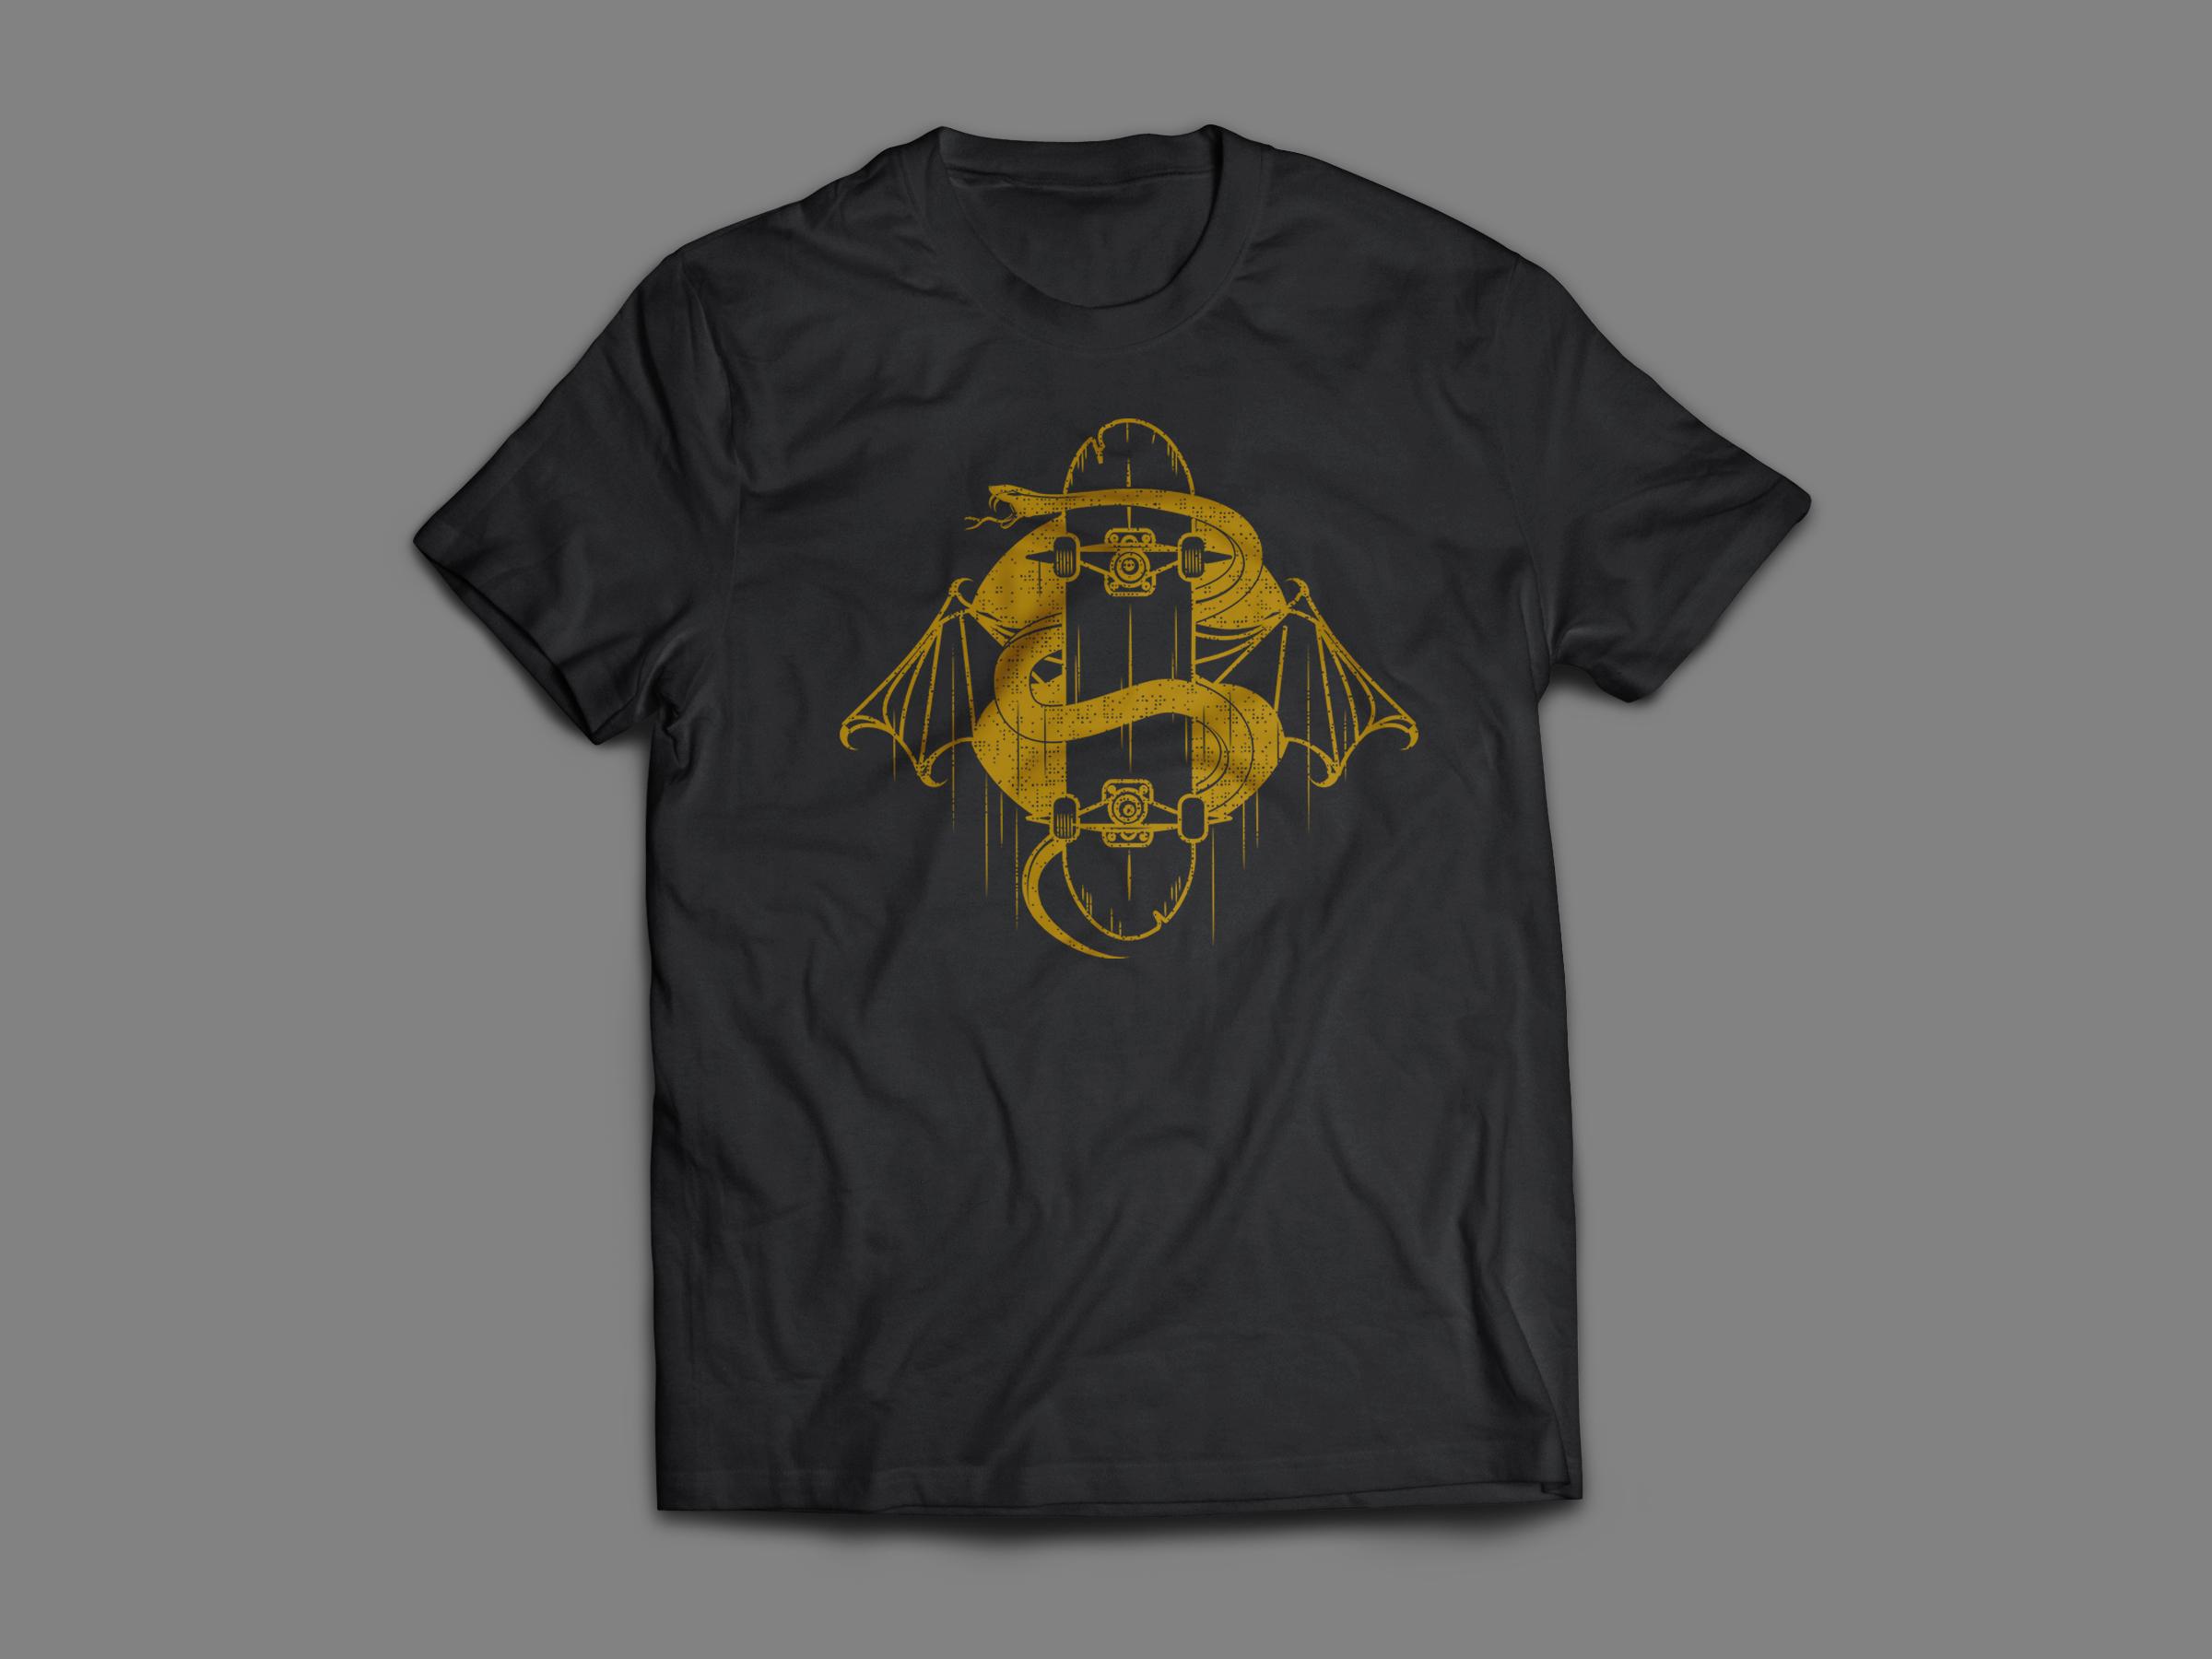 T Shirt Mockup Front Sn - Diseñadores Invitados. Hoy: Raúl Ruano